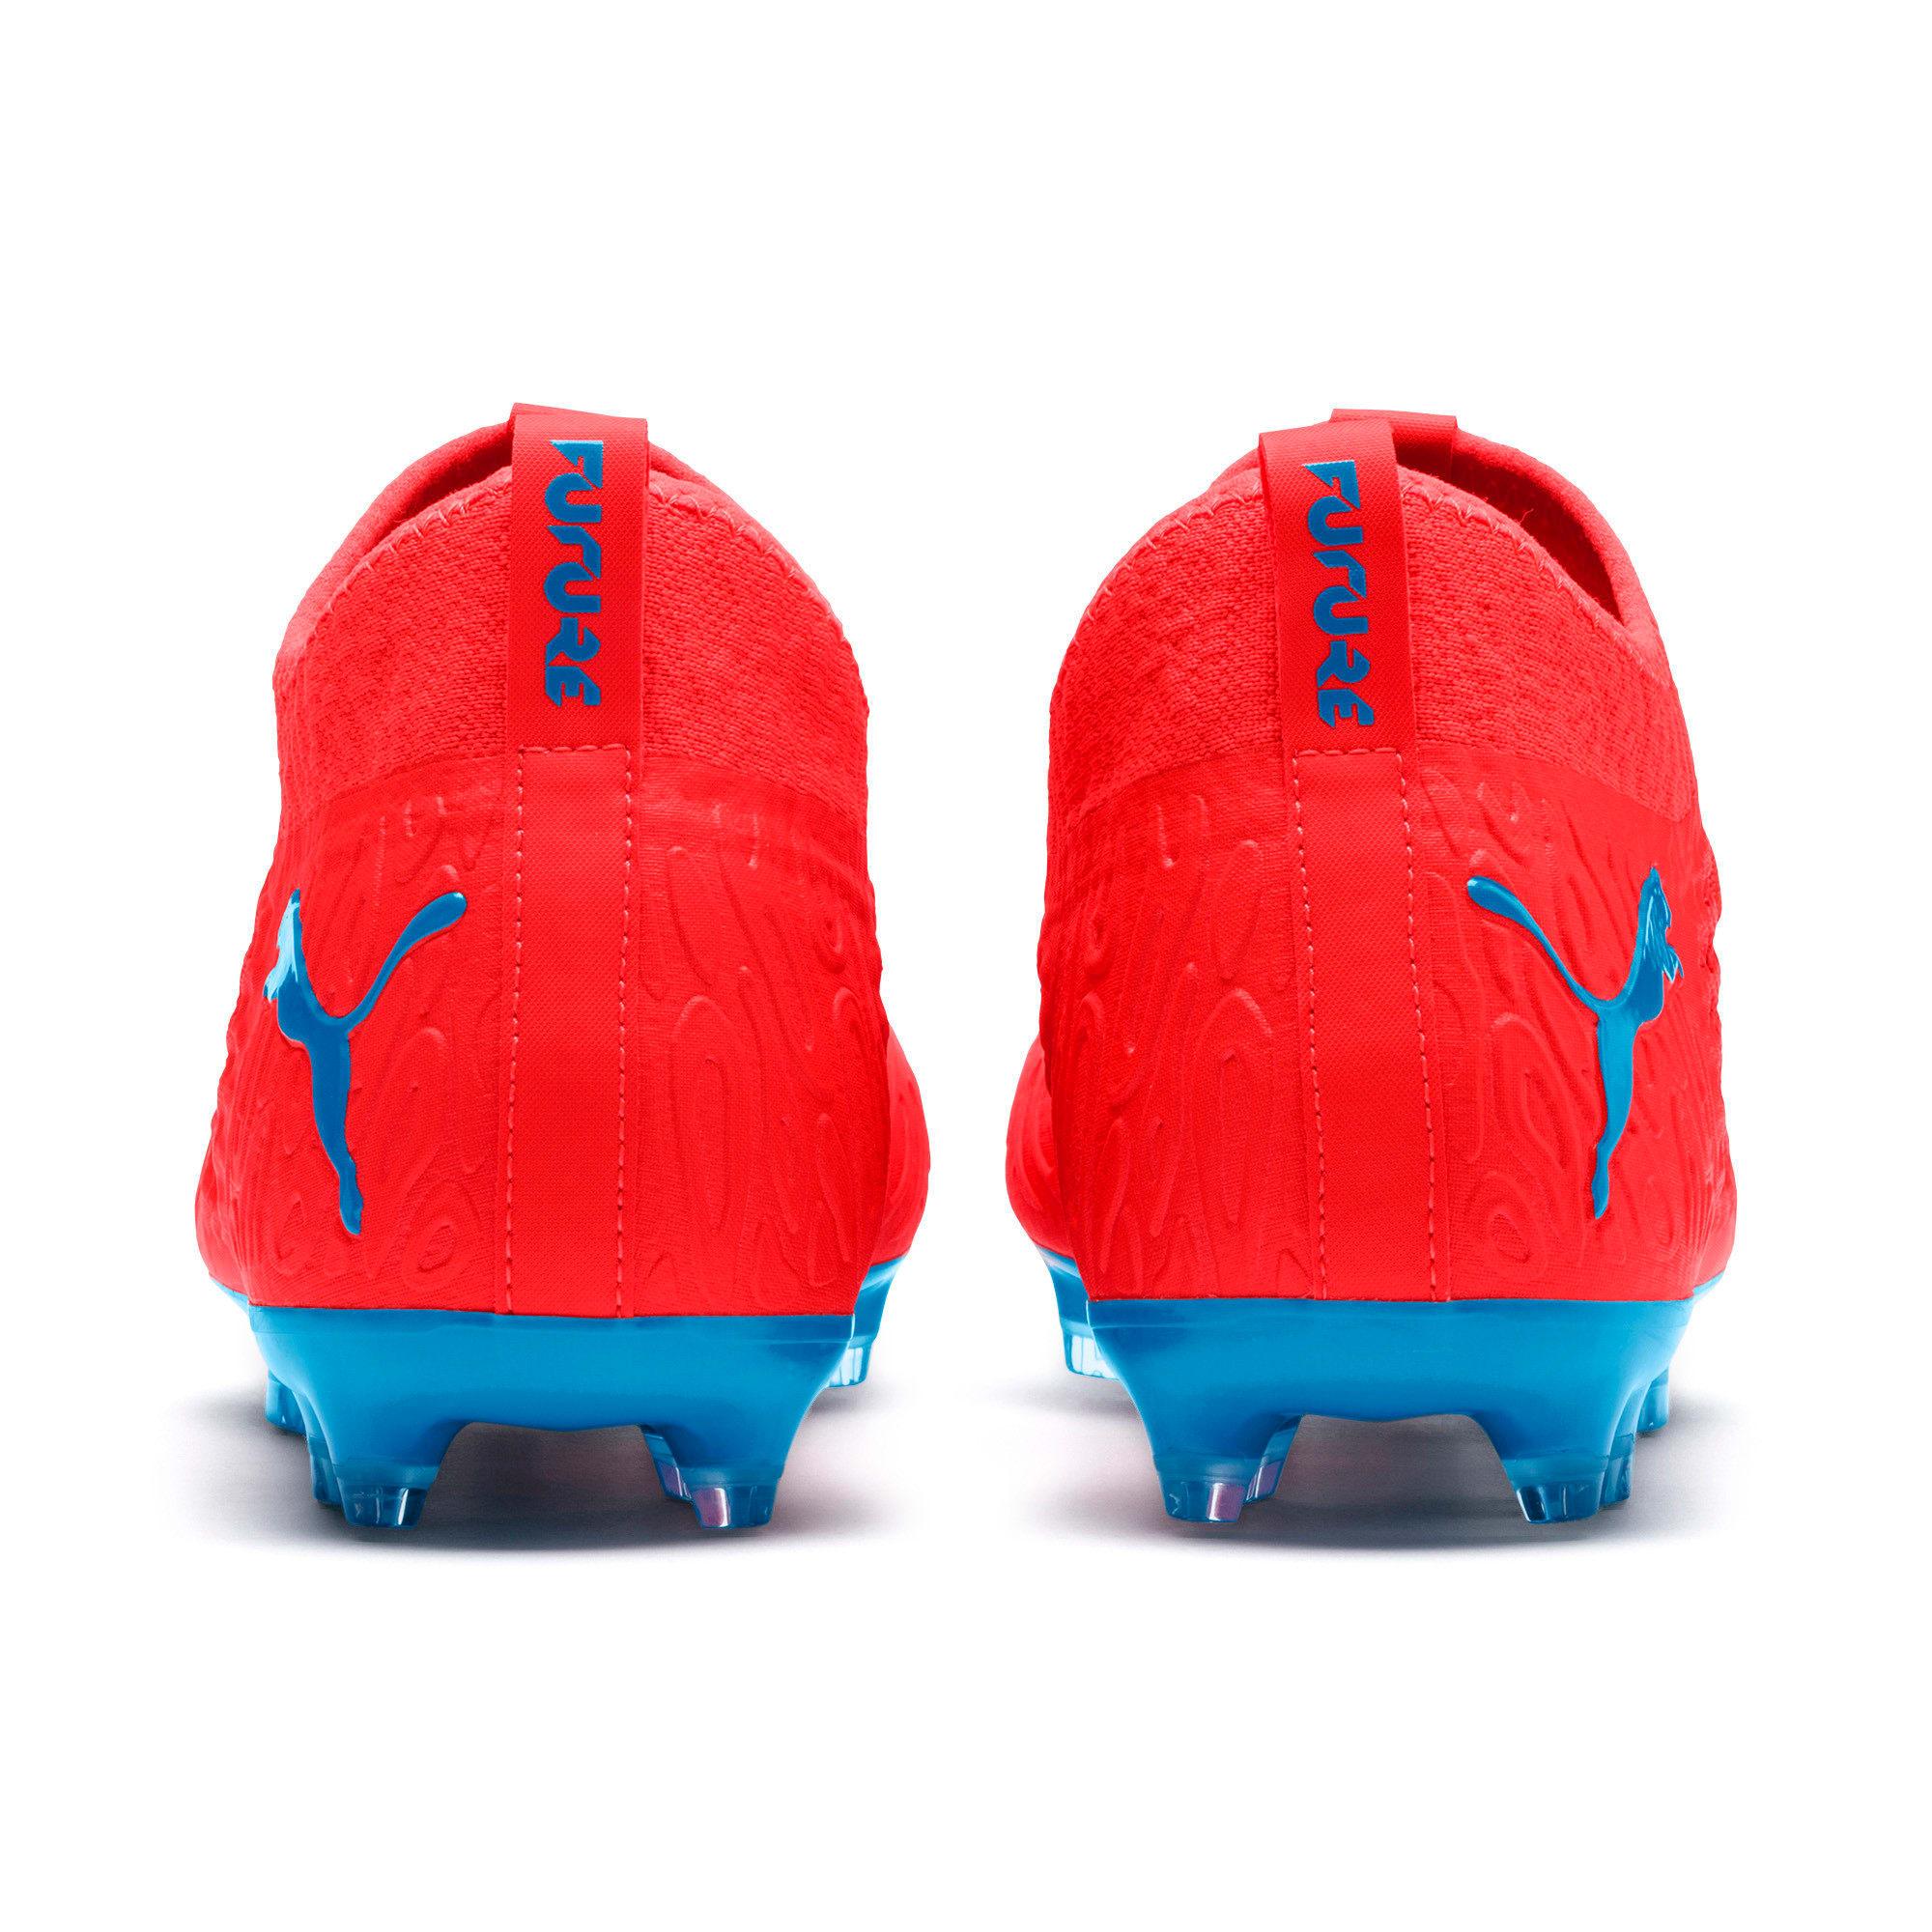 Thumbnail 3 of FUTURE 19.3 NETFIT FG/AG Men's Soccer Cleats, Red Blast-Bleu Azur, medium